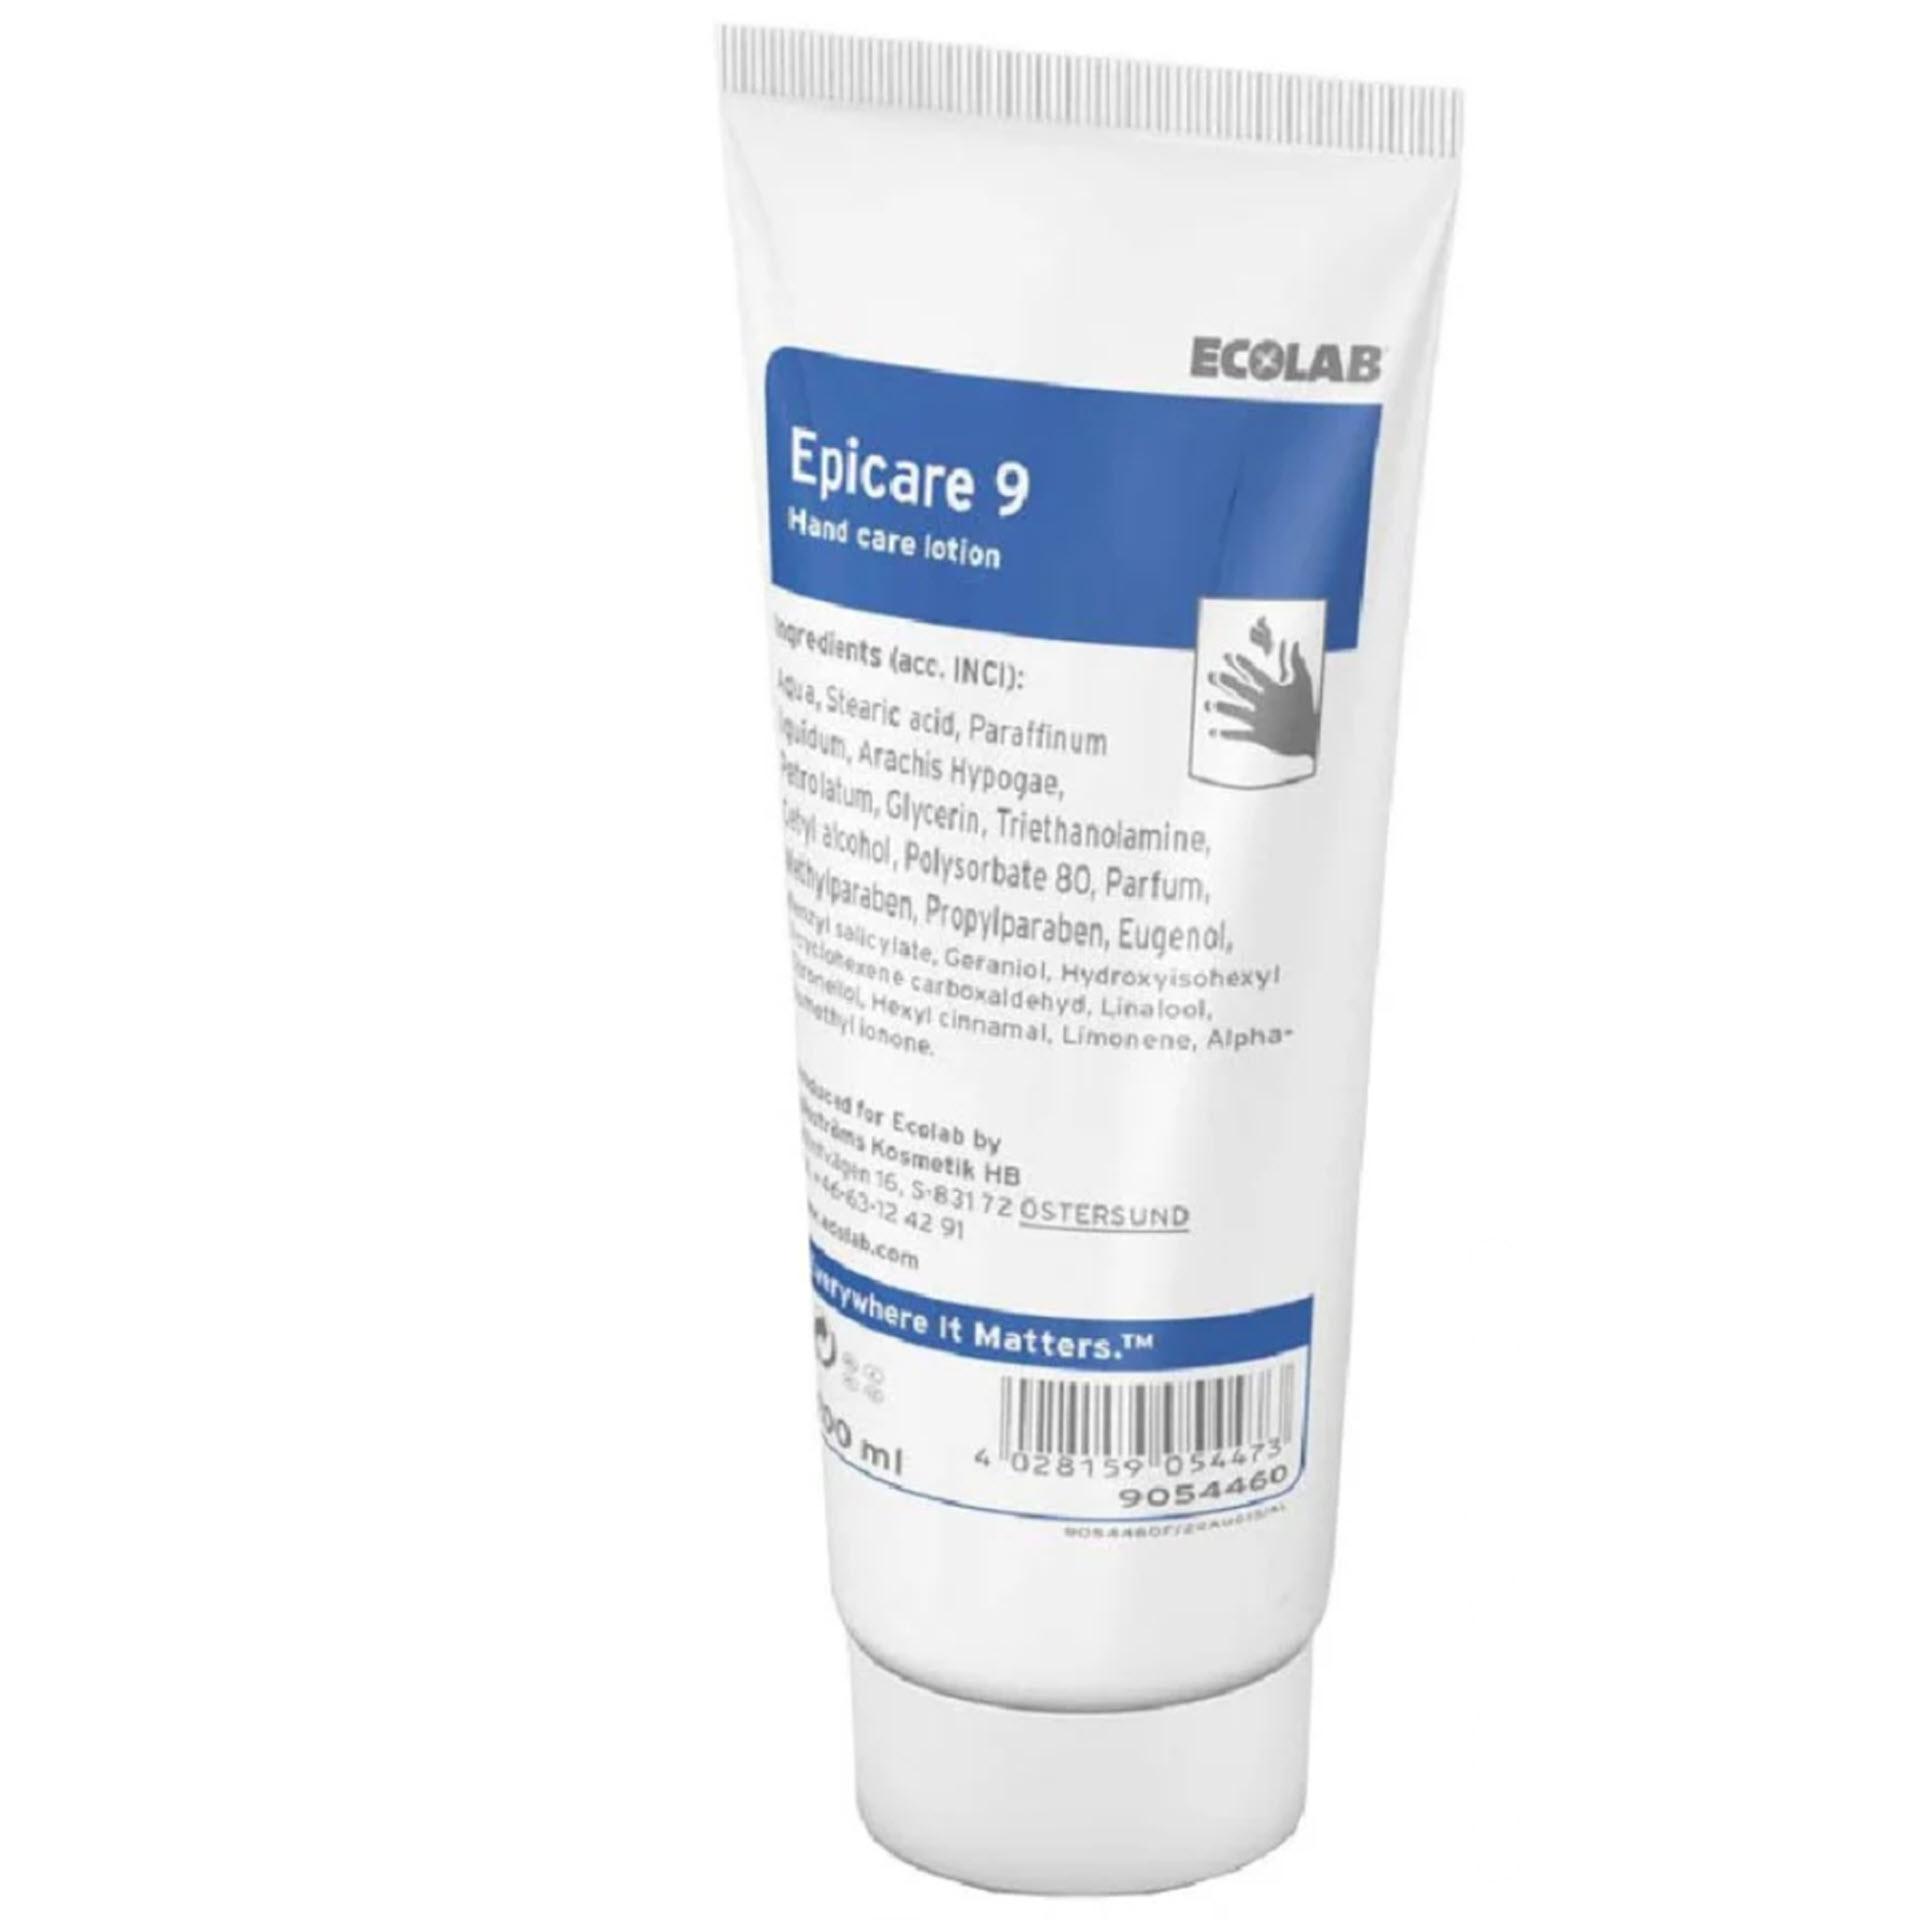 ECOLAB Epicare 9 Handcreme - 200 ml Tube